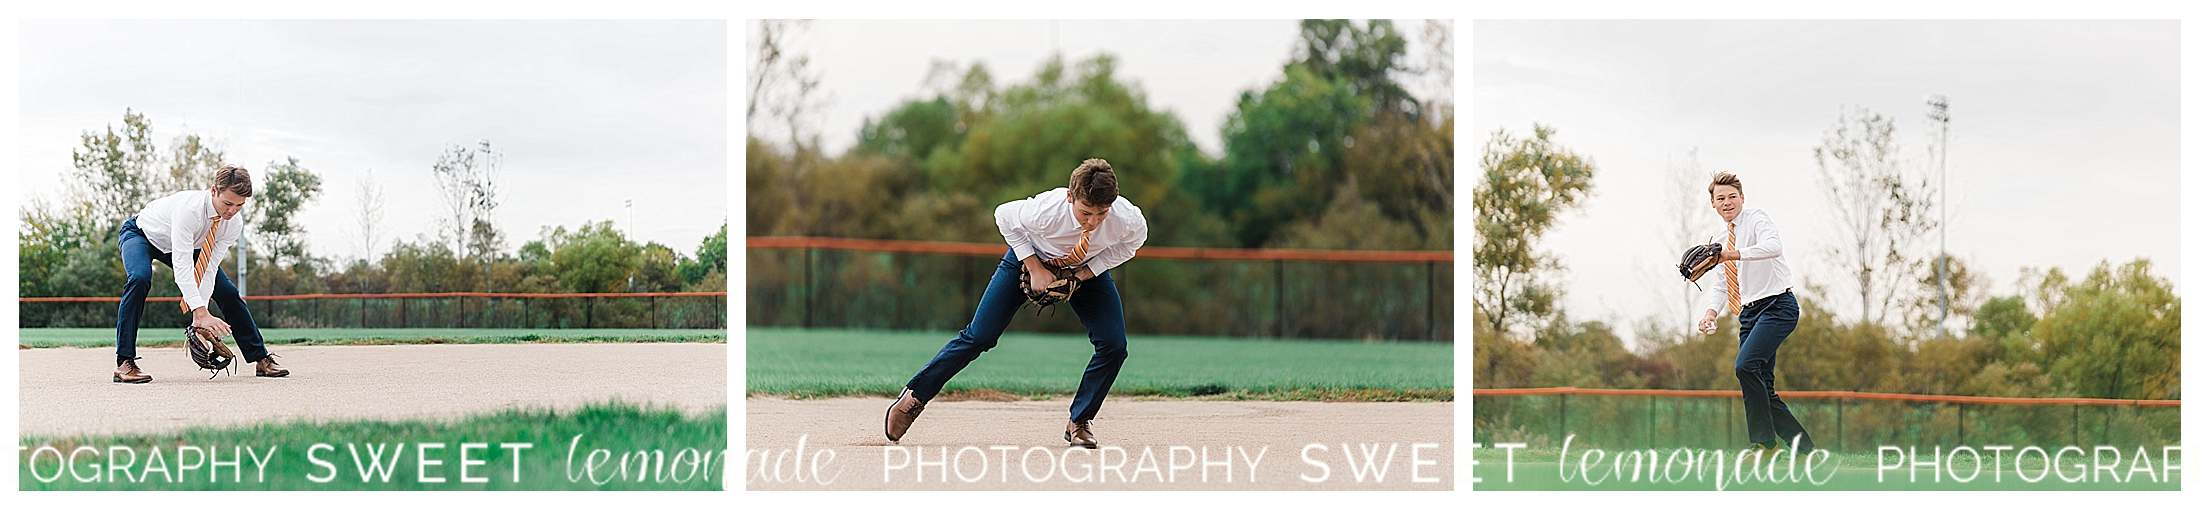 champaign-parkland-baseball-mahomet-illinois-senior-photographer-sweet-lemonade-photography_1802.jpg